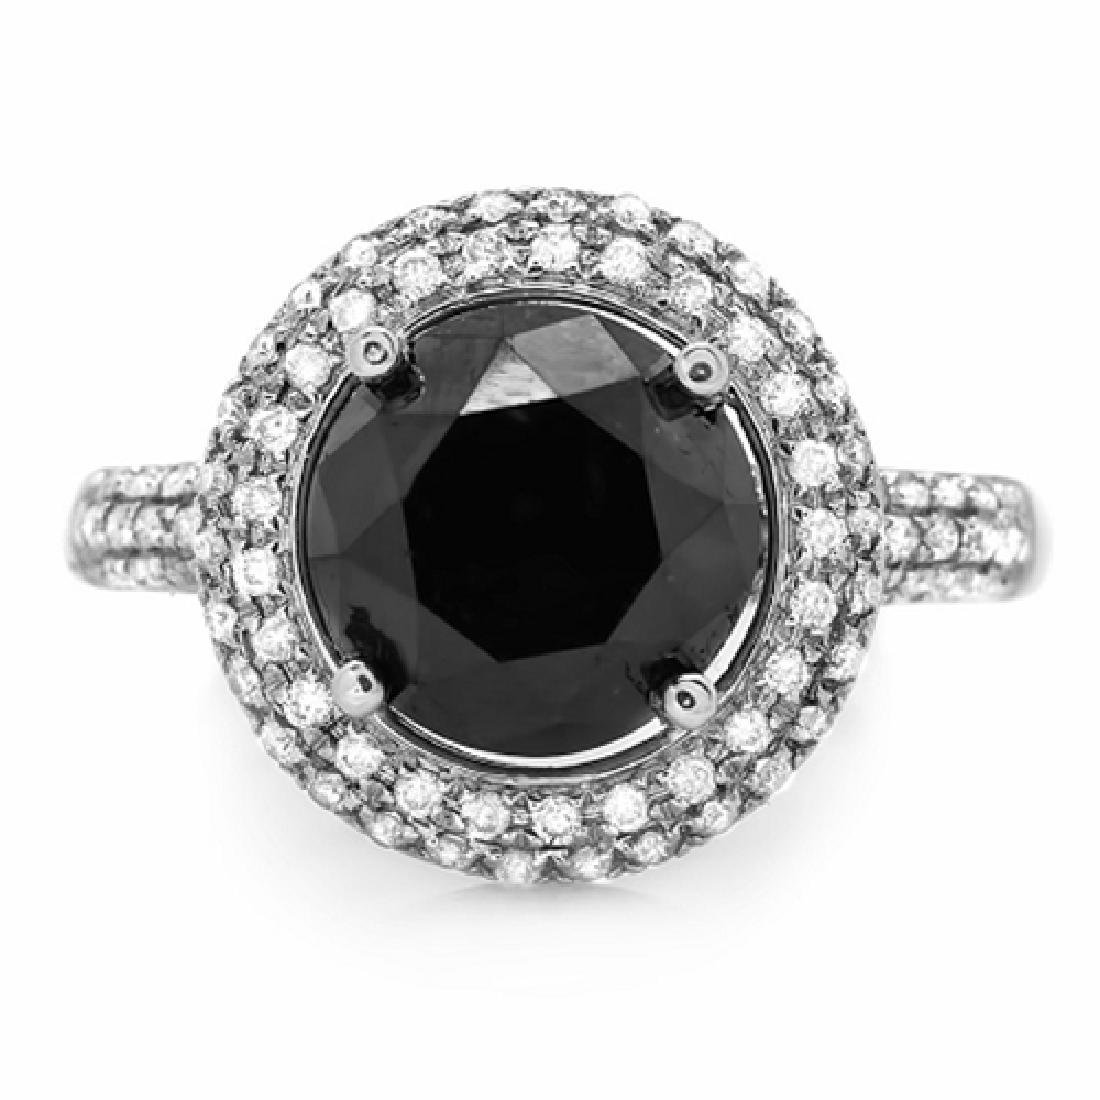 4.64 Carat Natural Diamond 18K Solid White Gold Ring - 2